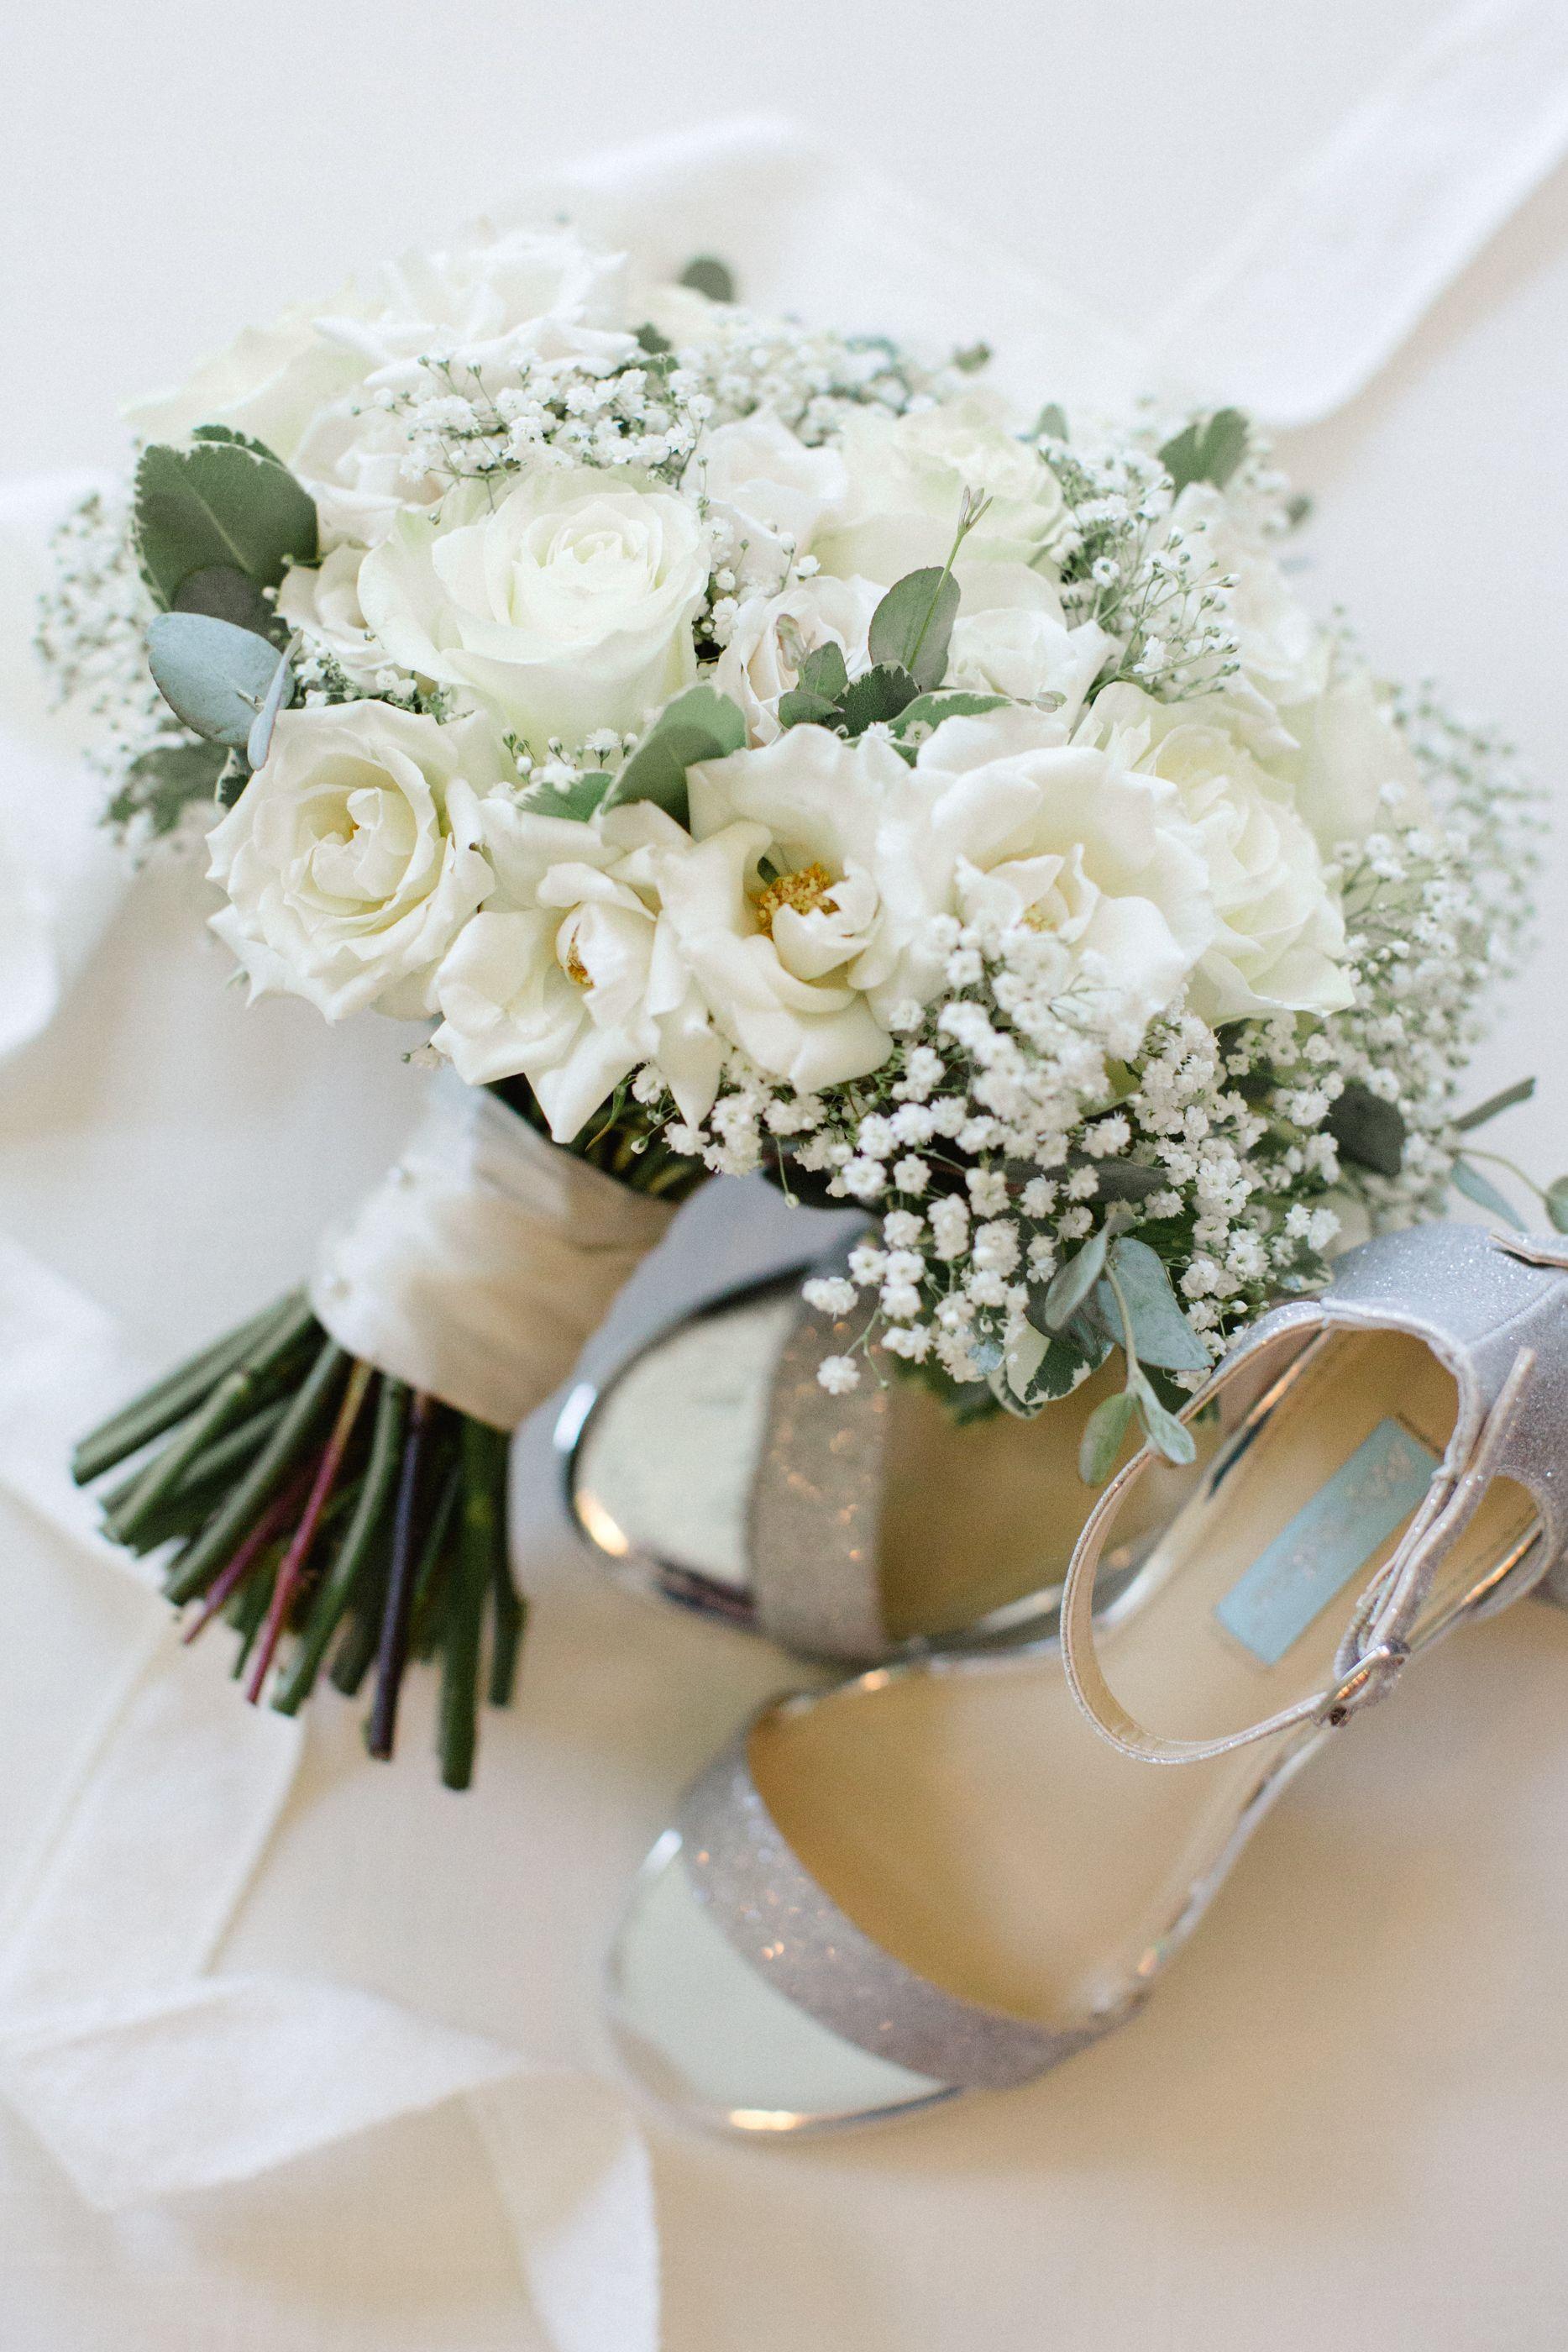 Jordan Denike Photography L White Wedding Bouquet And Silver Shoes L Wedding Detail White Rose Wedding Bouquet White Rose Bridal Bouquet White Wedding Bouquets